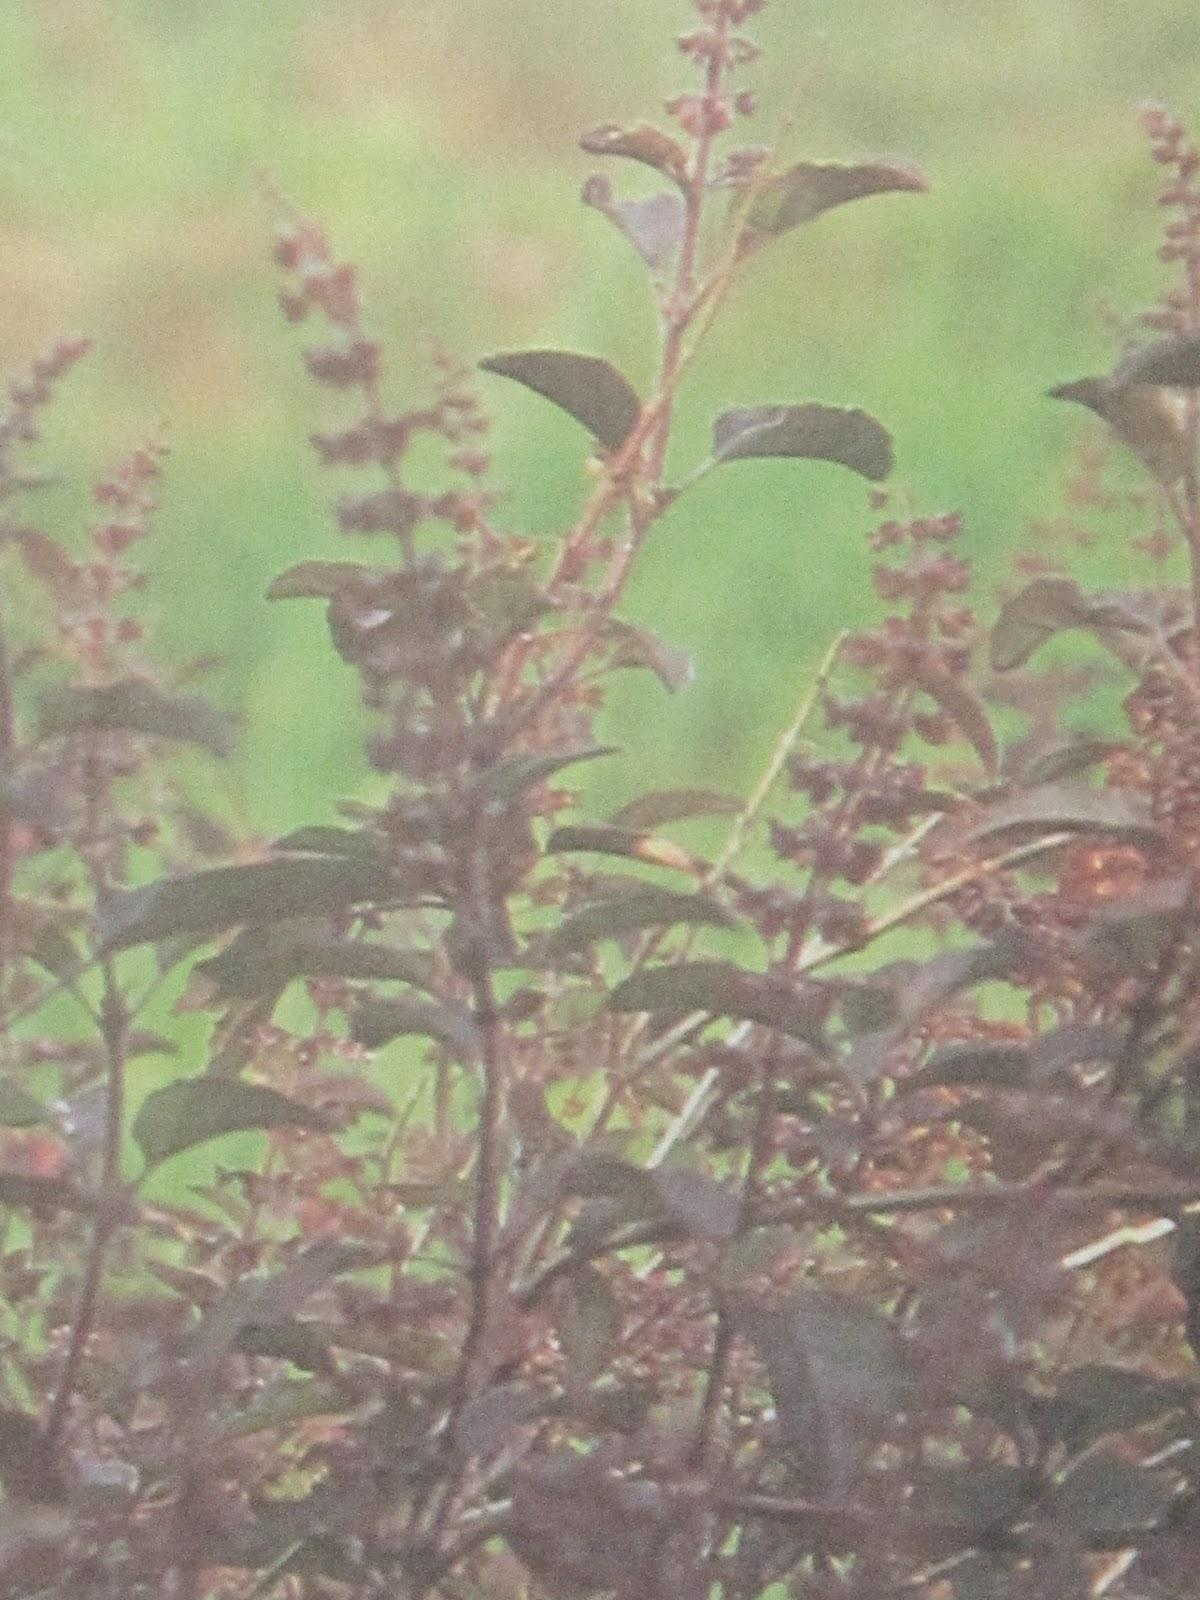 herbal leaves, herbal medicine plants and treatments ...